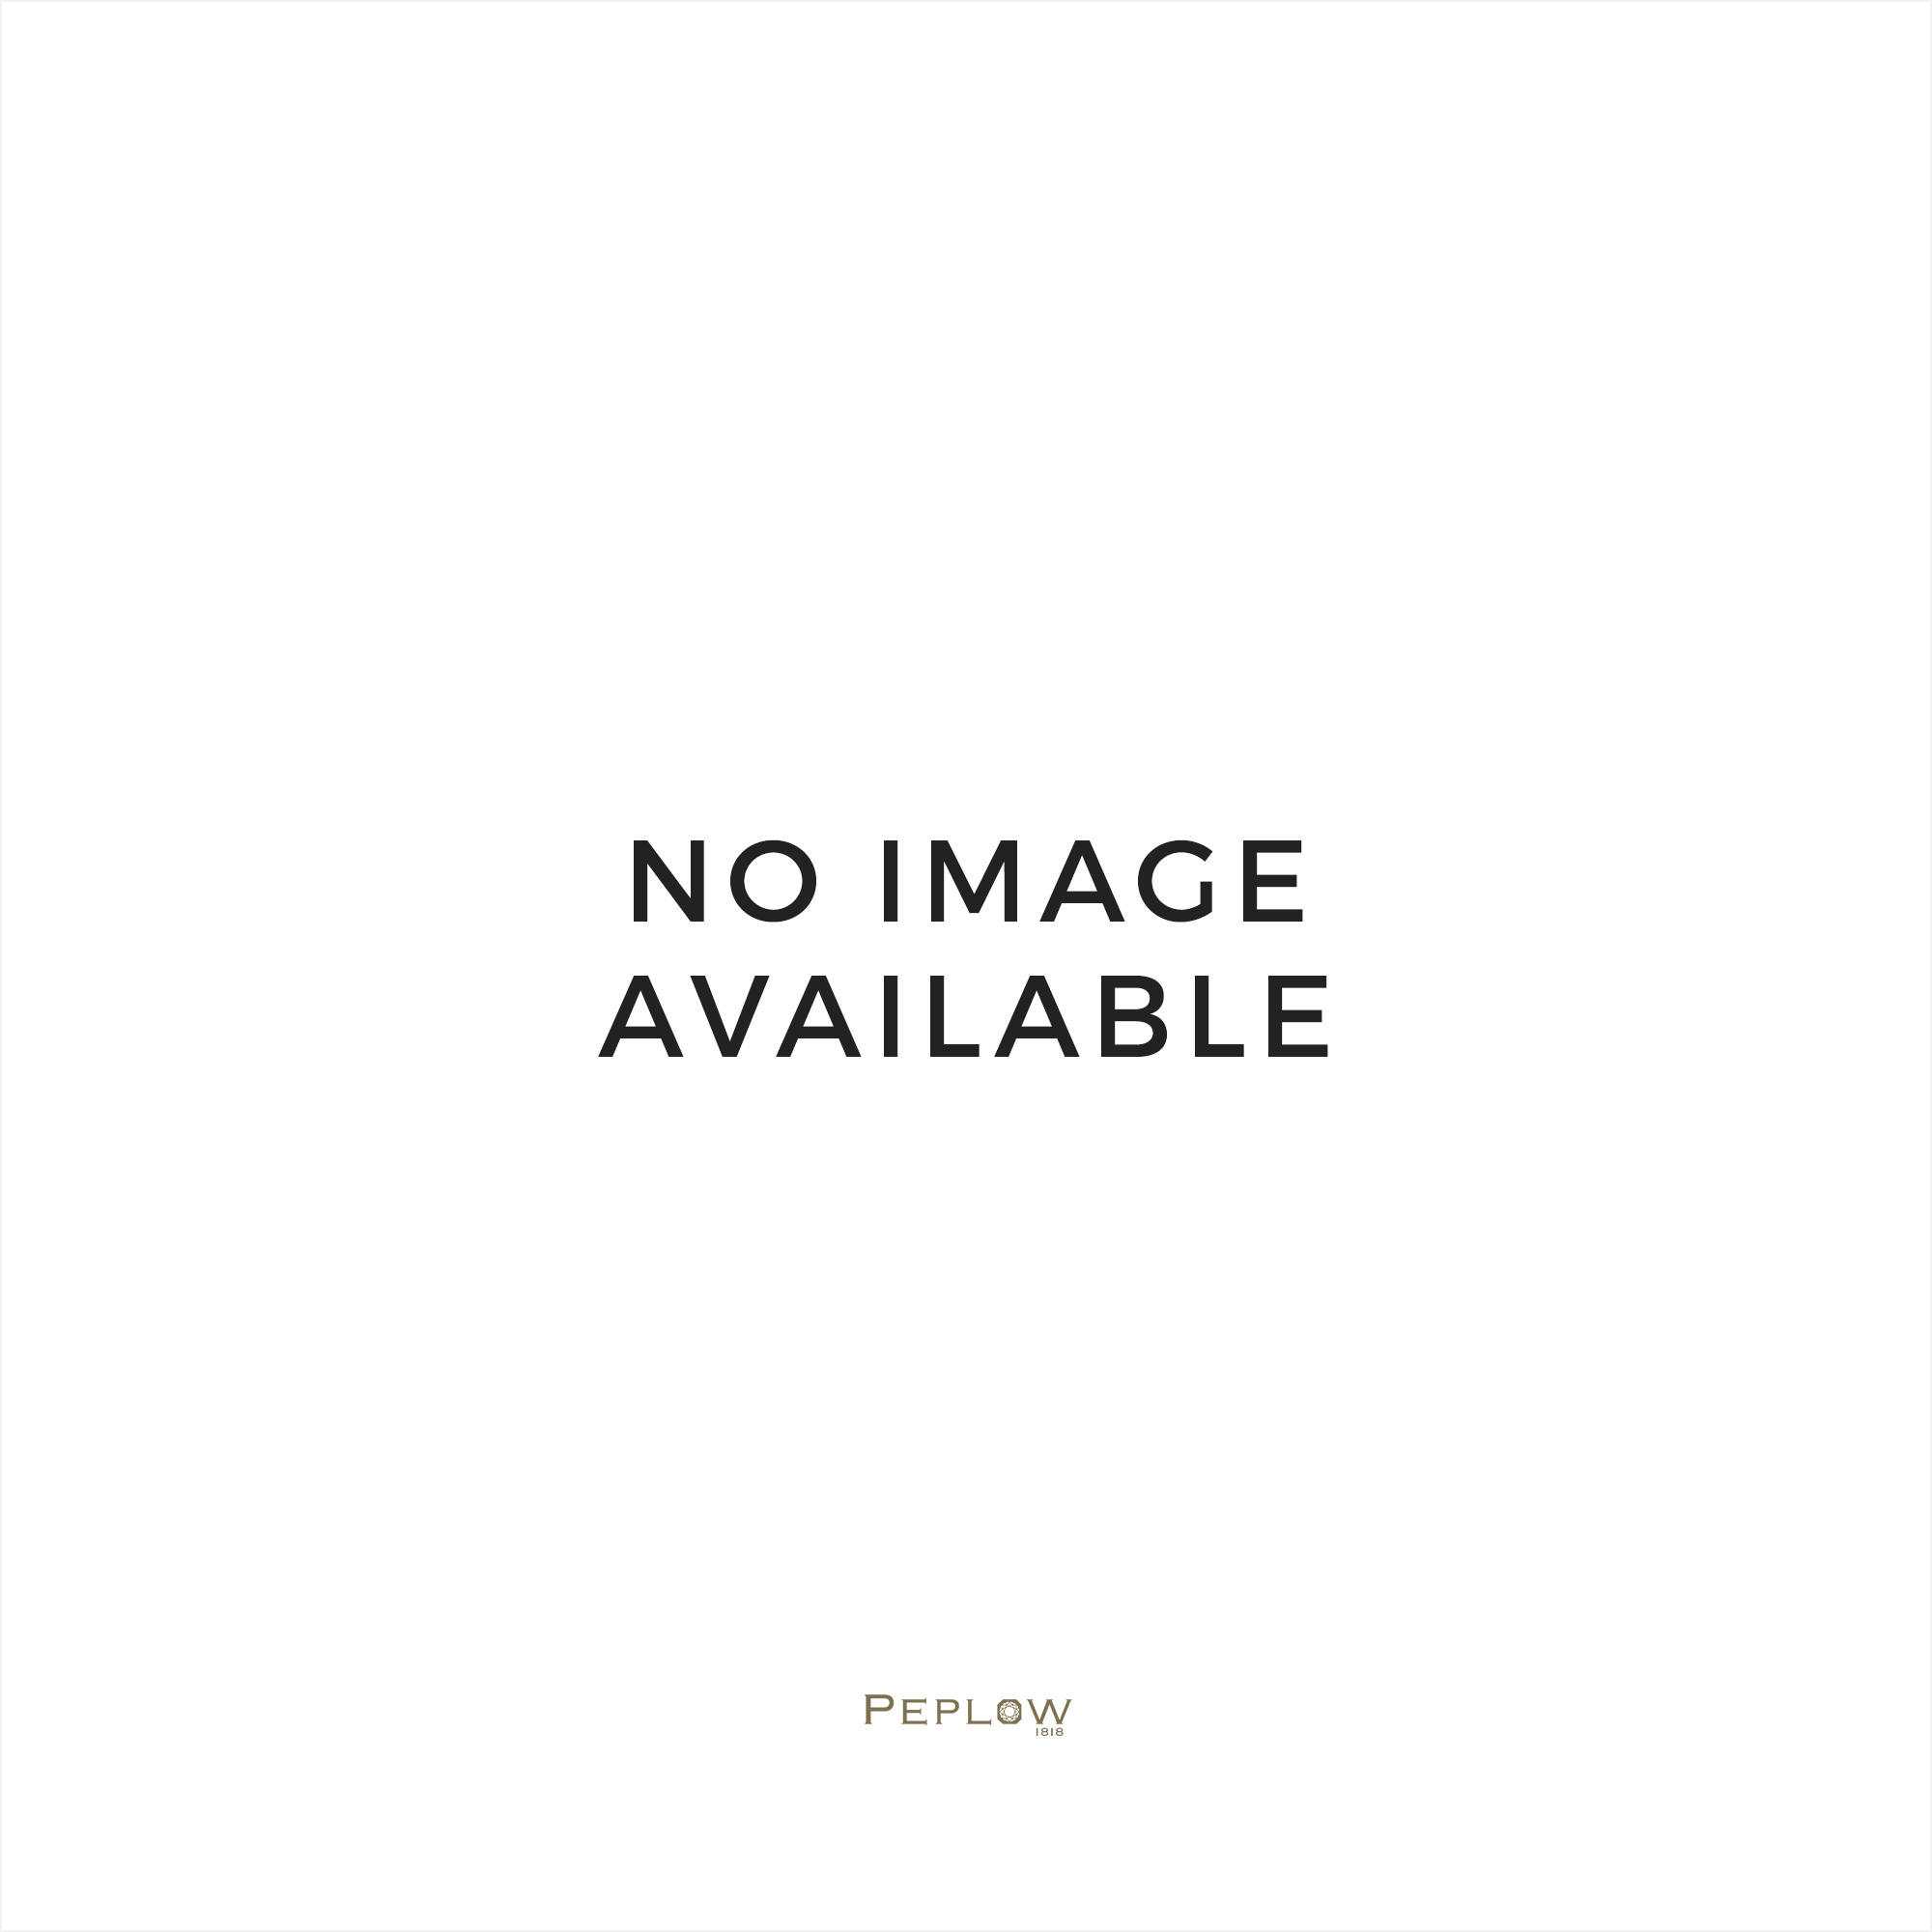 Seiko Watches Seiko Mens Stainless Steel Automatic Watch